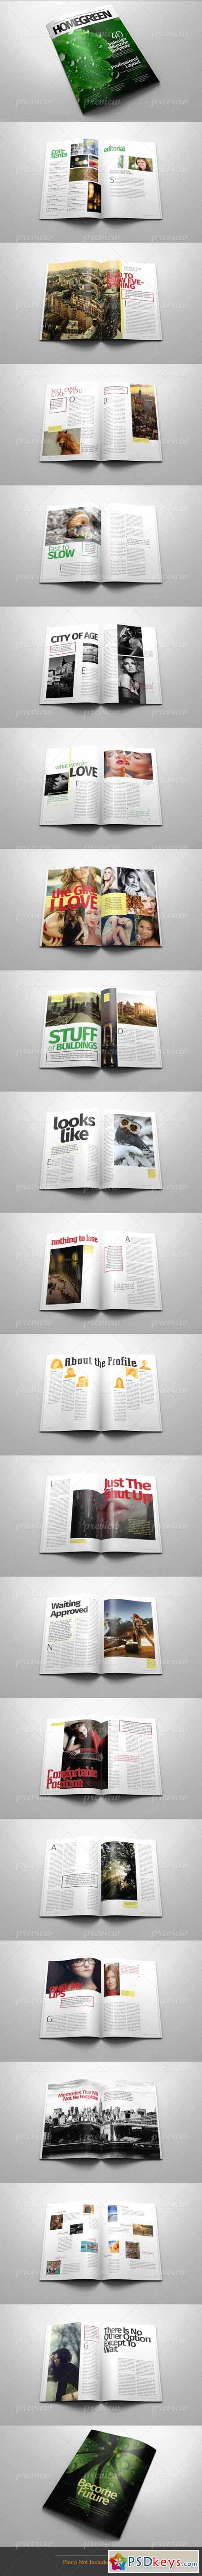 A4 Letter Indesign Magazine Template v.01 3367